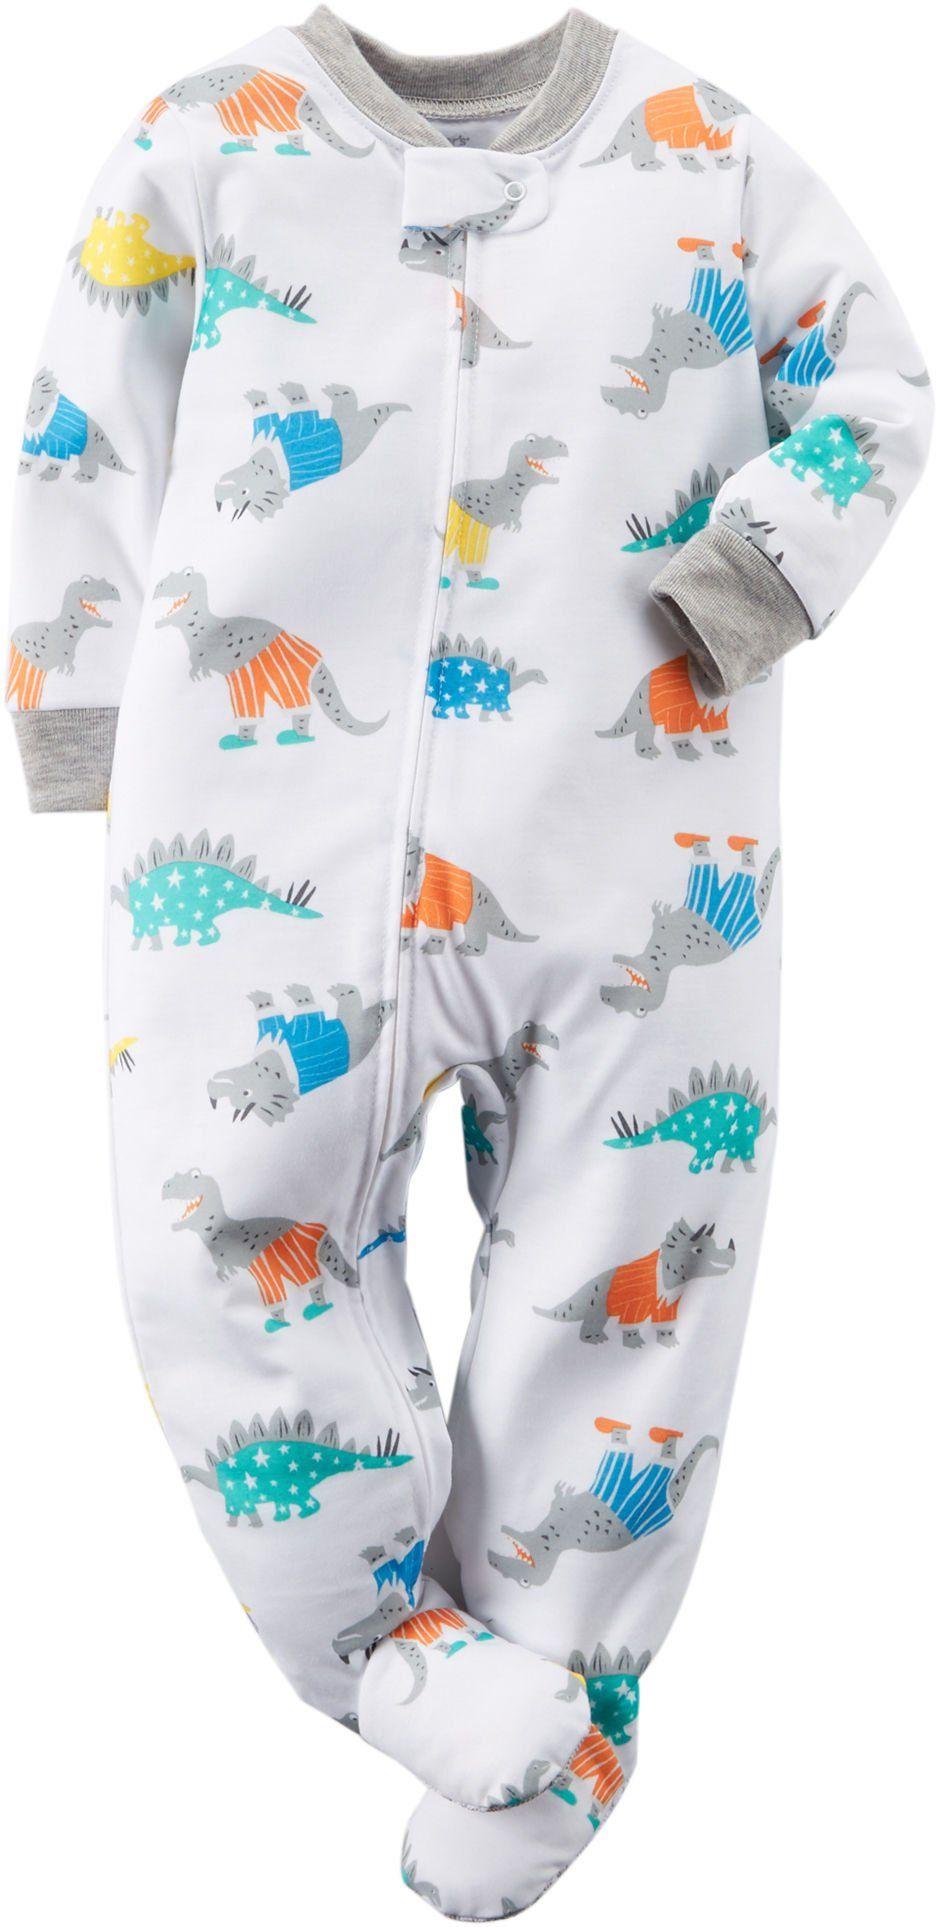 7ac8d5bd19a6 Carters Dinosaur-Print Blanket Sleeper - Baby Boy. Body  100 ...